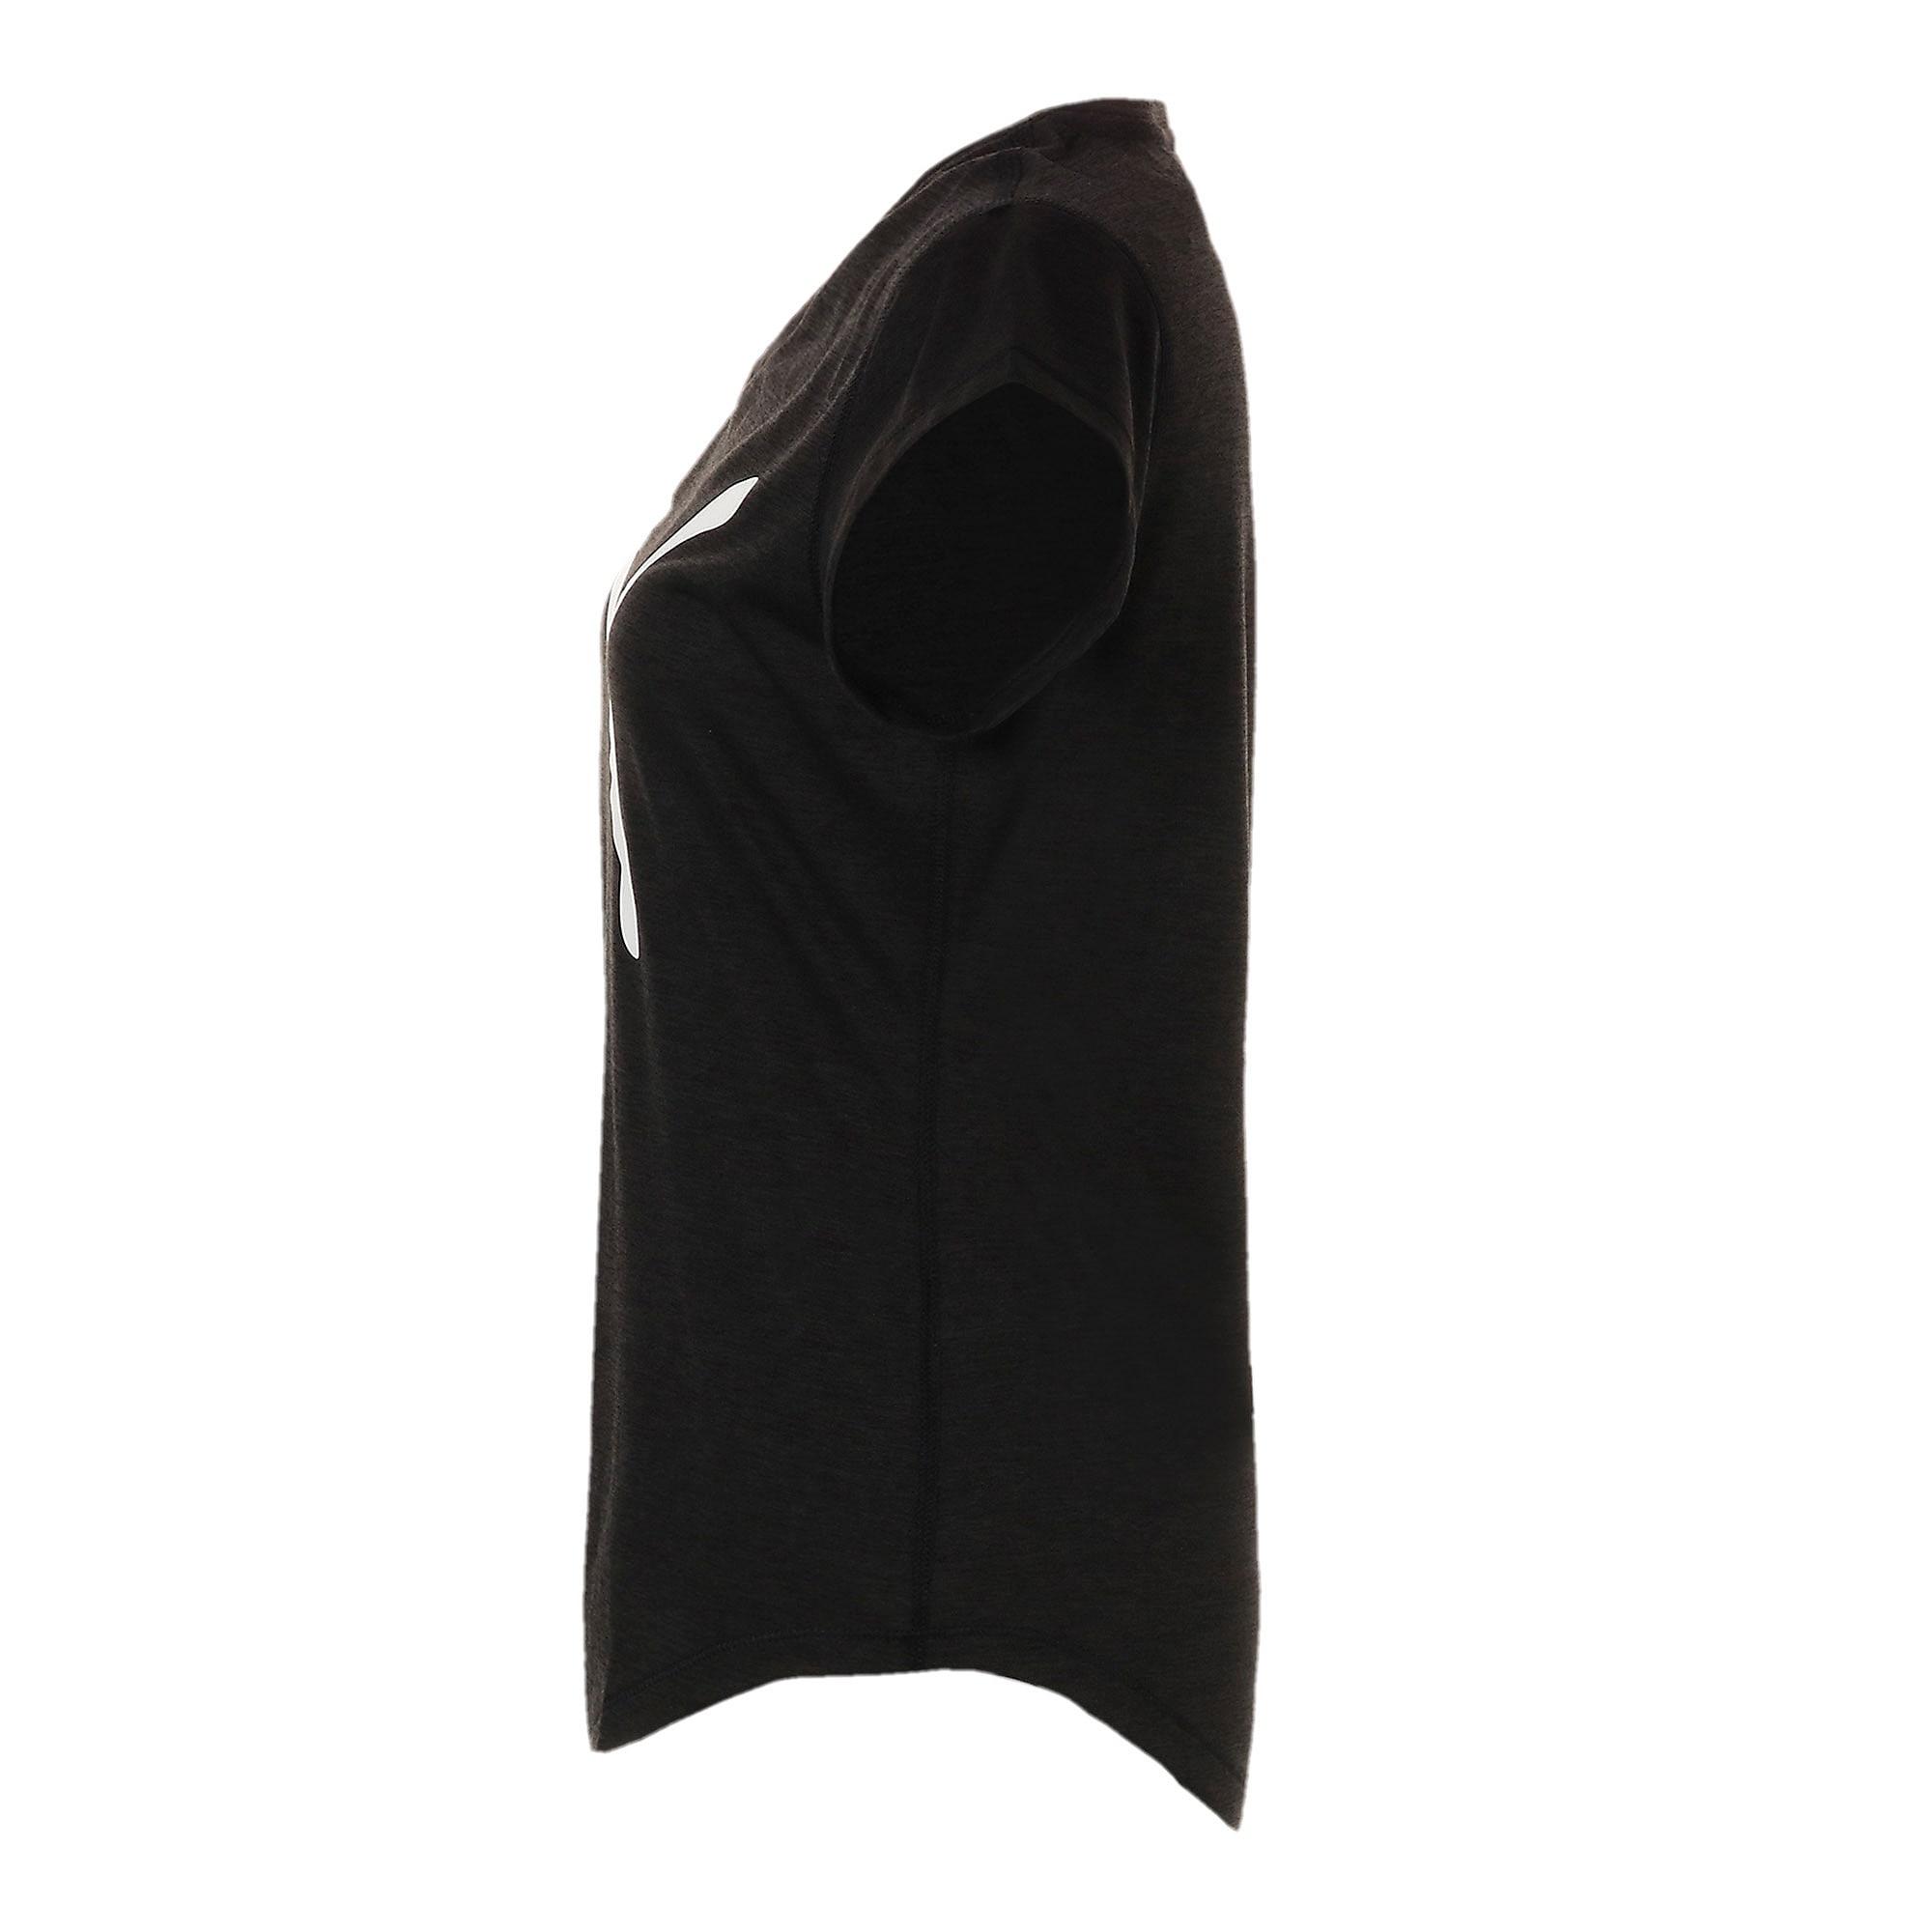 Thumbnail 5 of ヘザー キャット ウィメンズ ランニング Tシャツ 半袖, Puma Black, medium-JPN